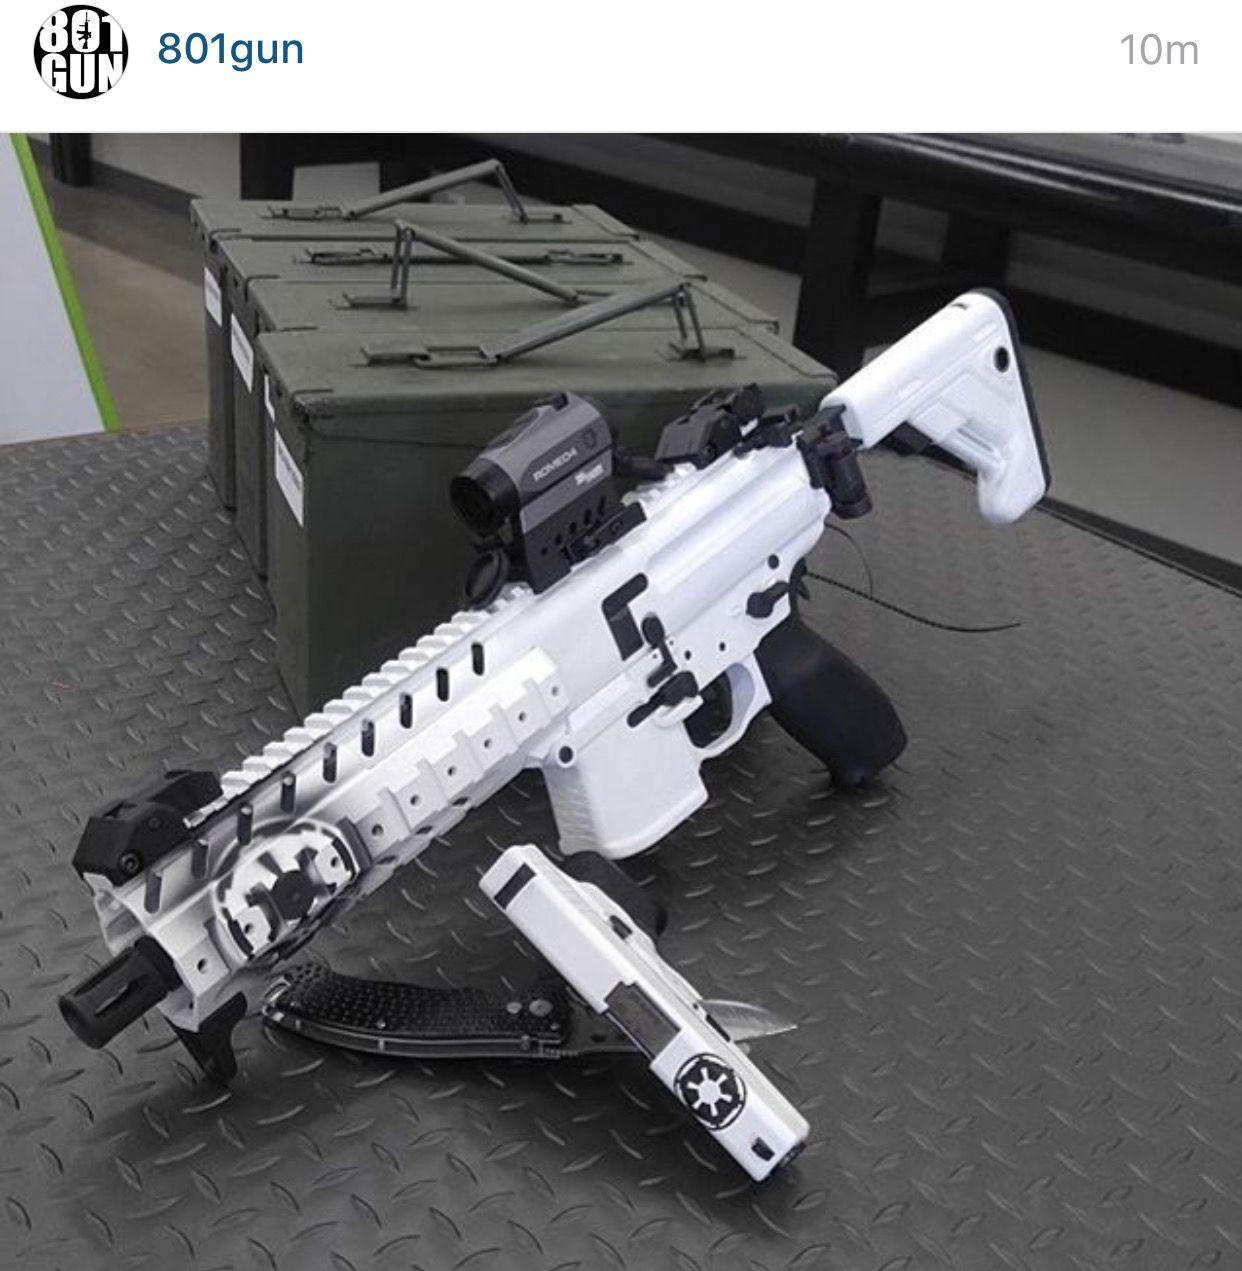 Custom Paint Matching Ar Sbr And Glock Badass Weapons